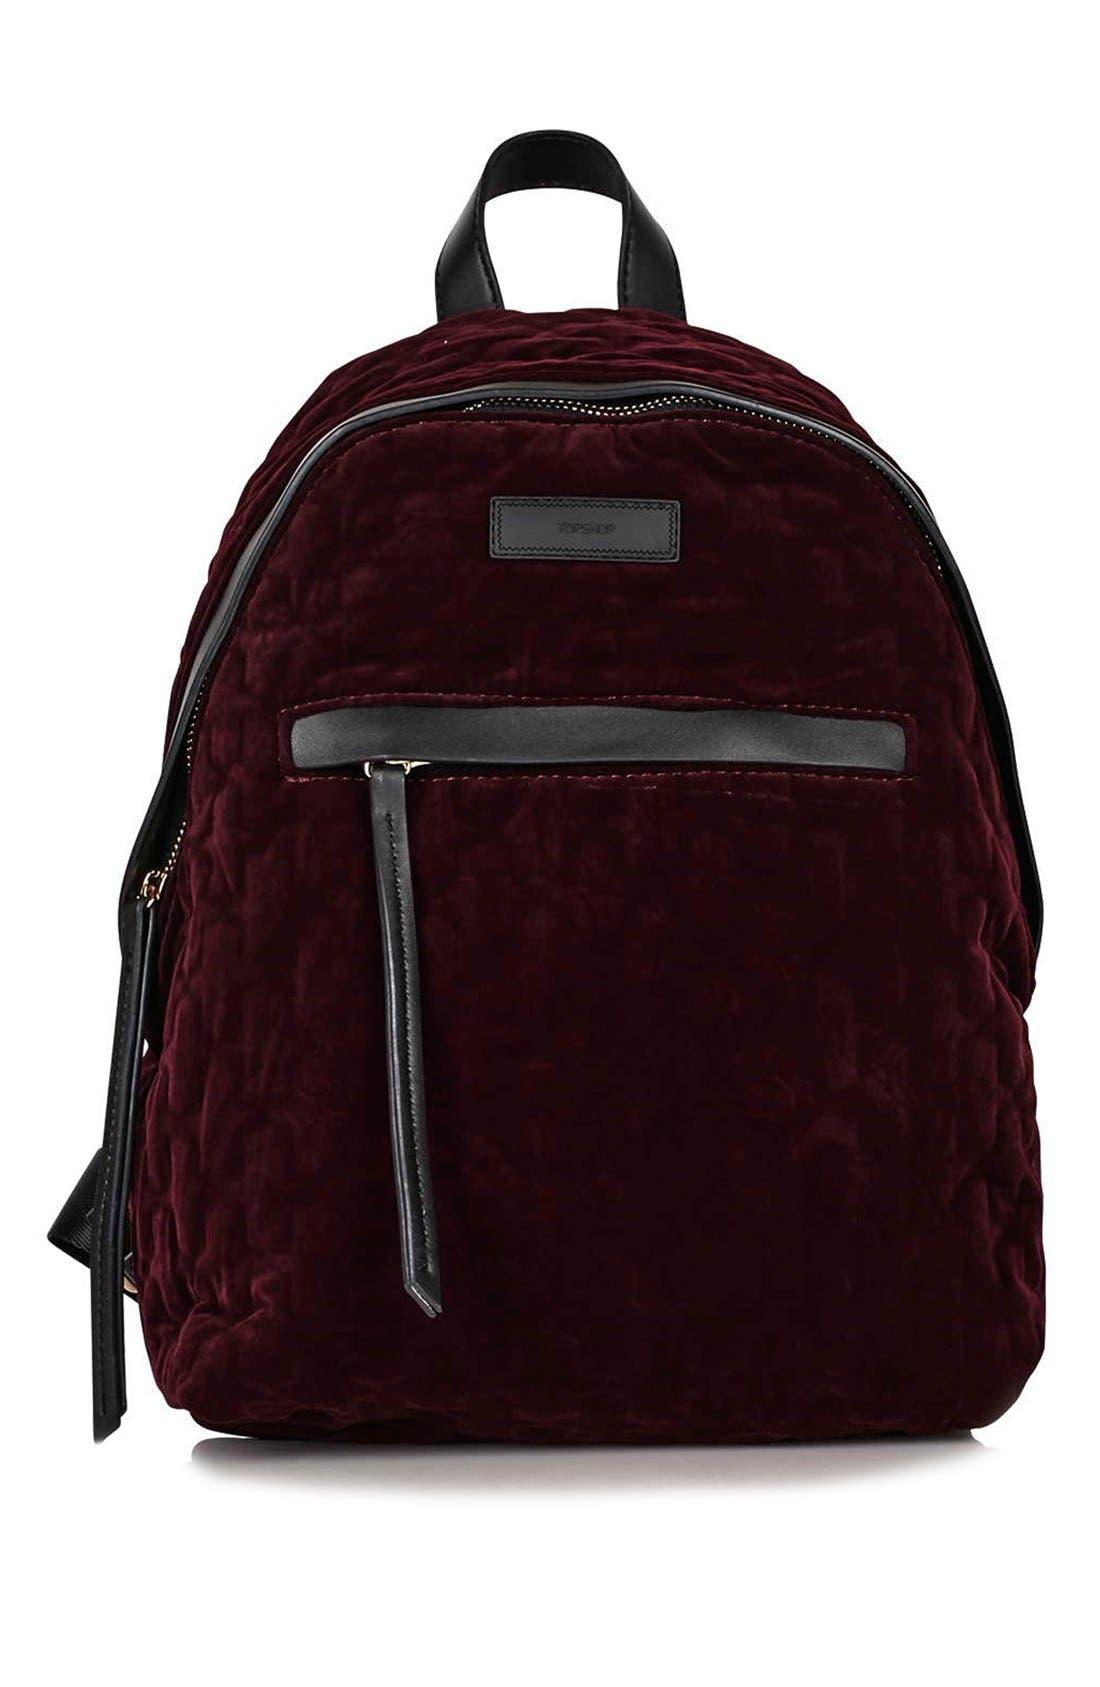 Main Image - Topshop 'Bristol' Velvet Backpack